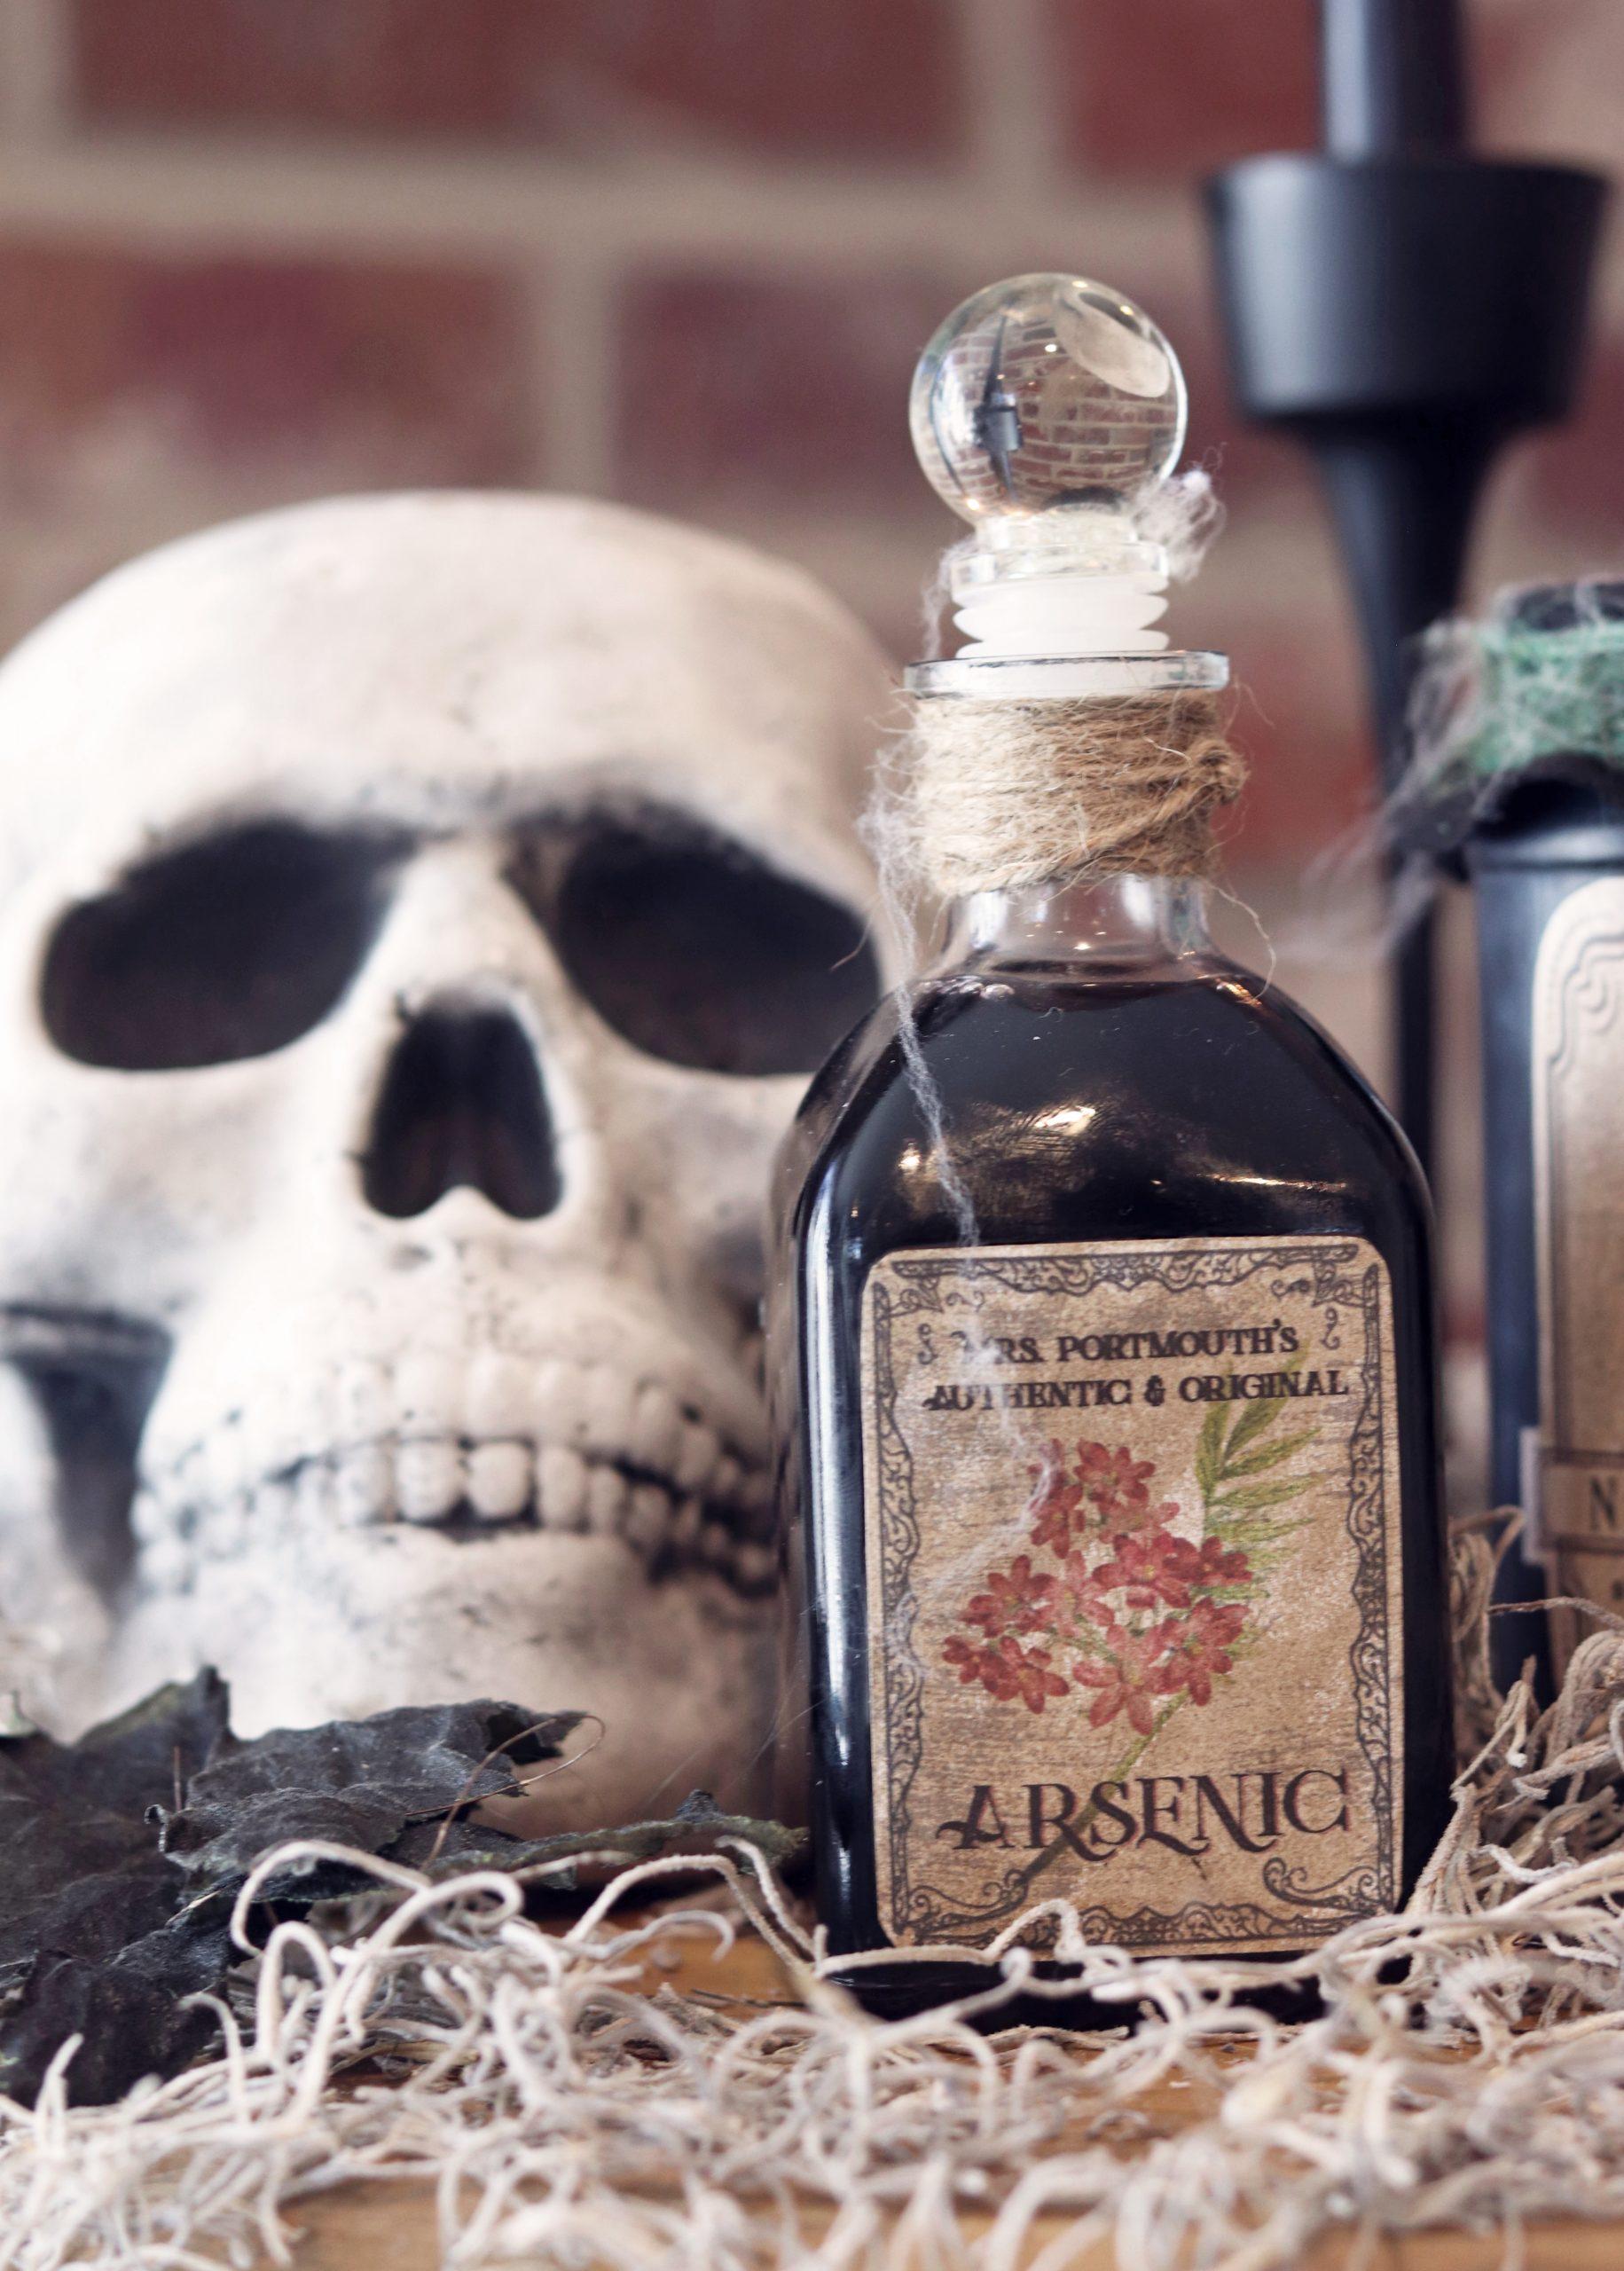 Boroughfare Arsenic Potion Bottle Halloween Decor